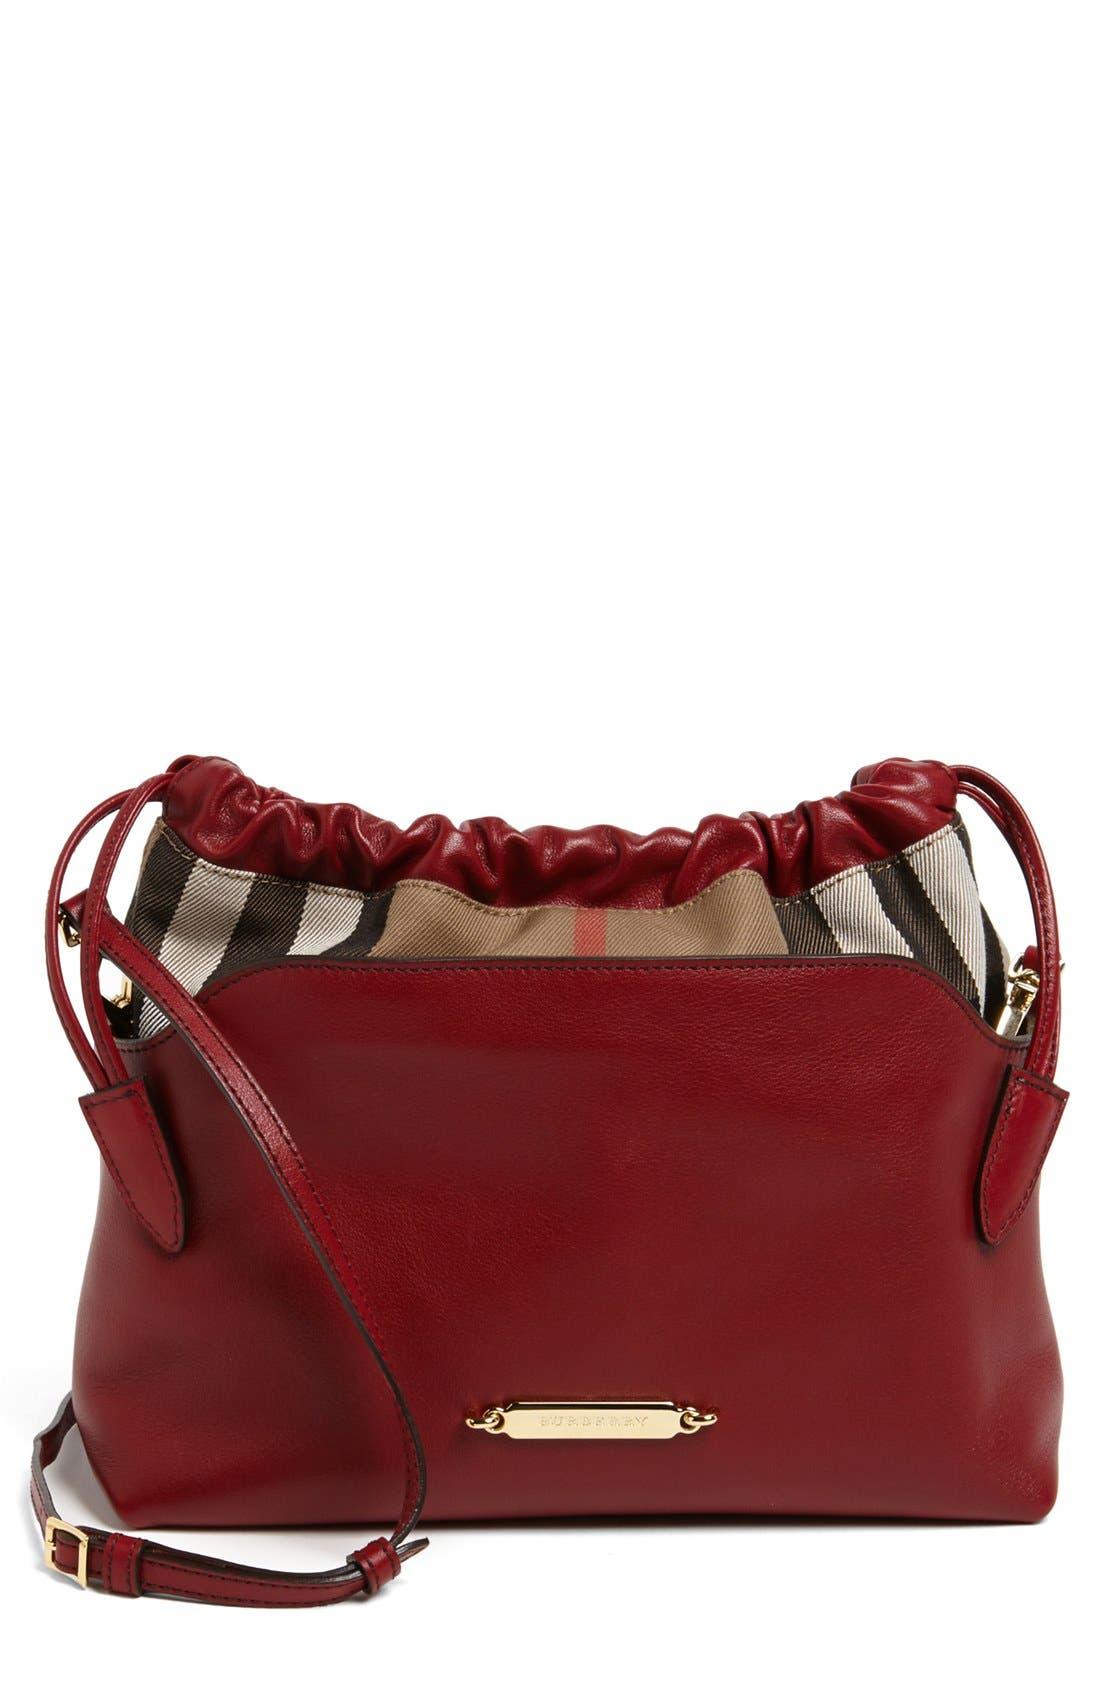 Main Image - Burberry 'Little Crush - House Check' Leather Crossbody Bag